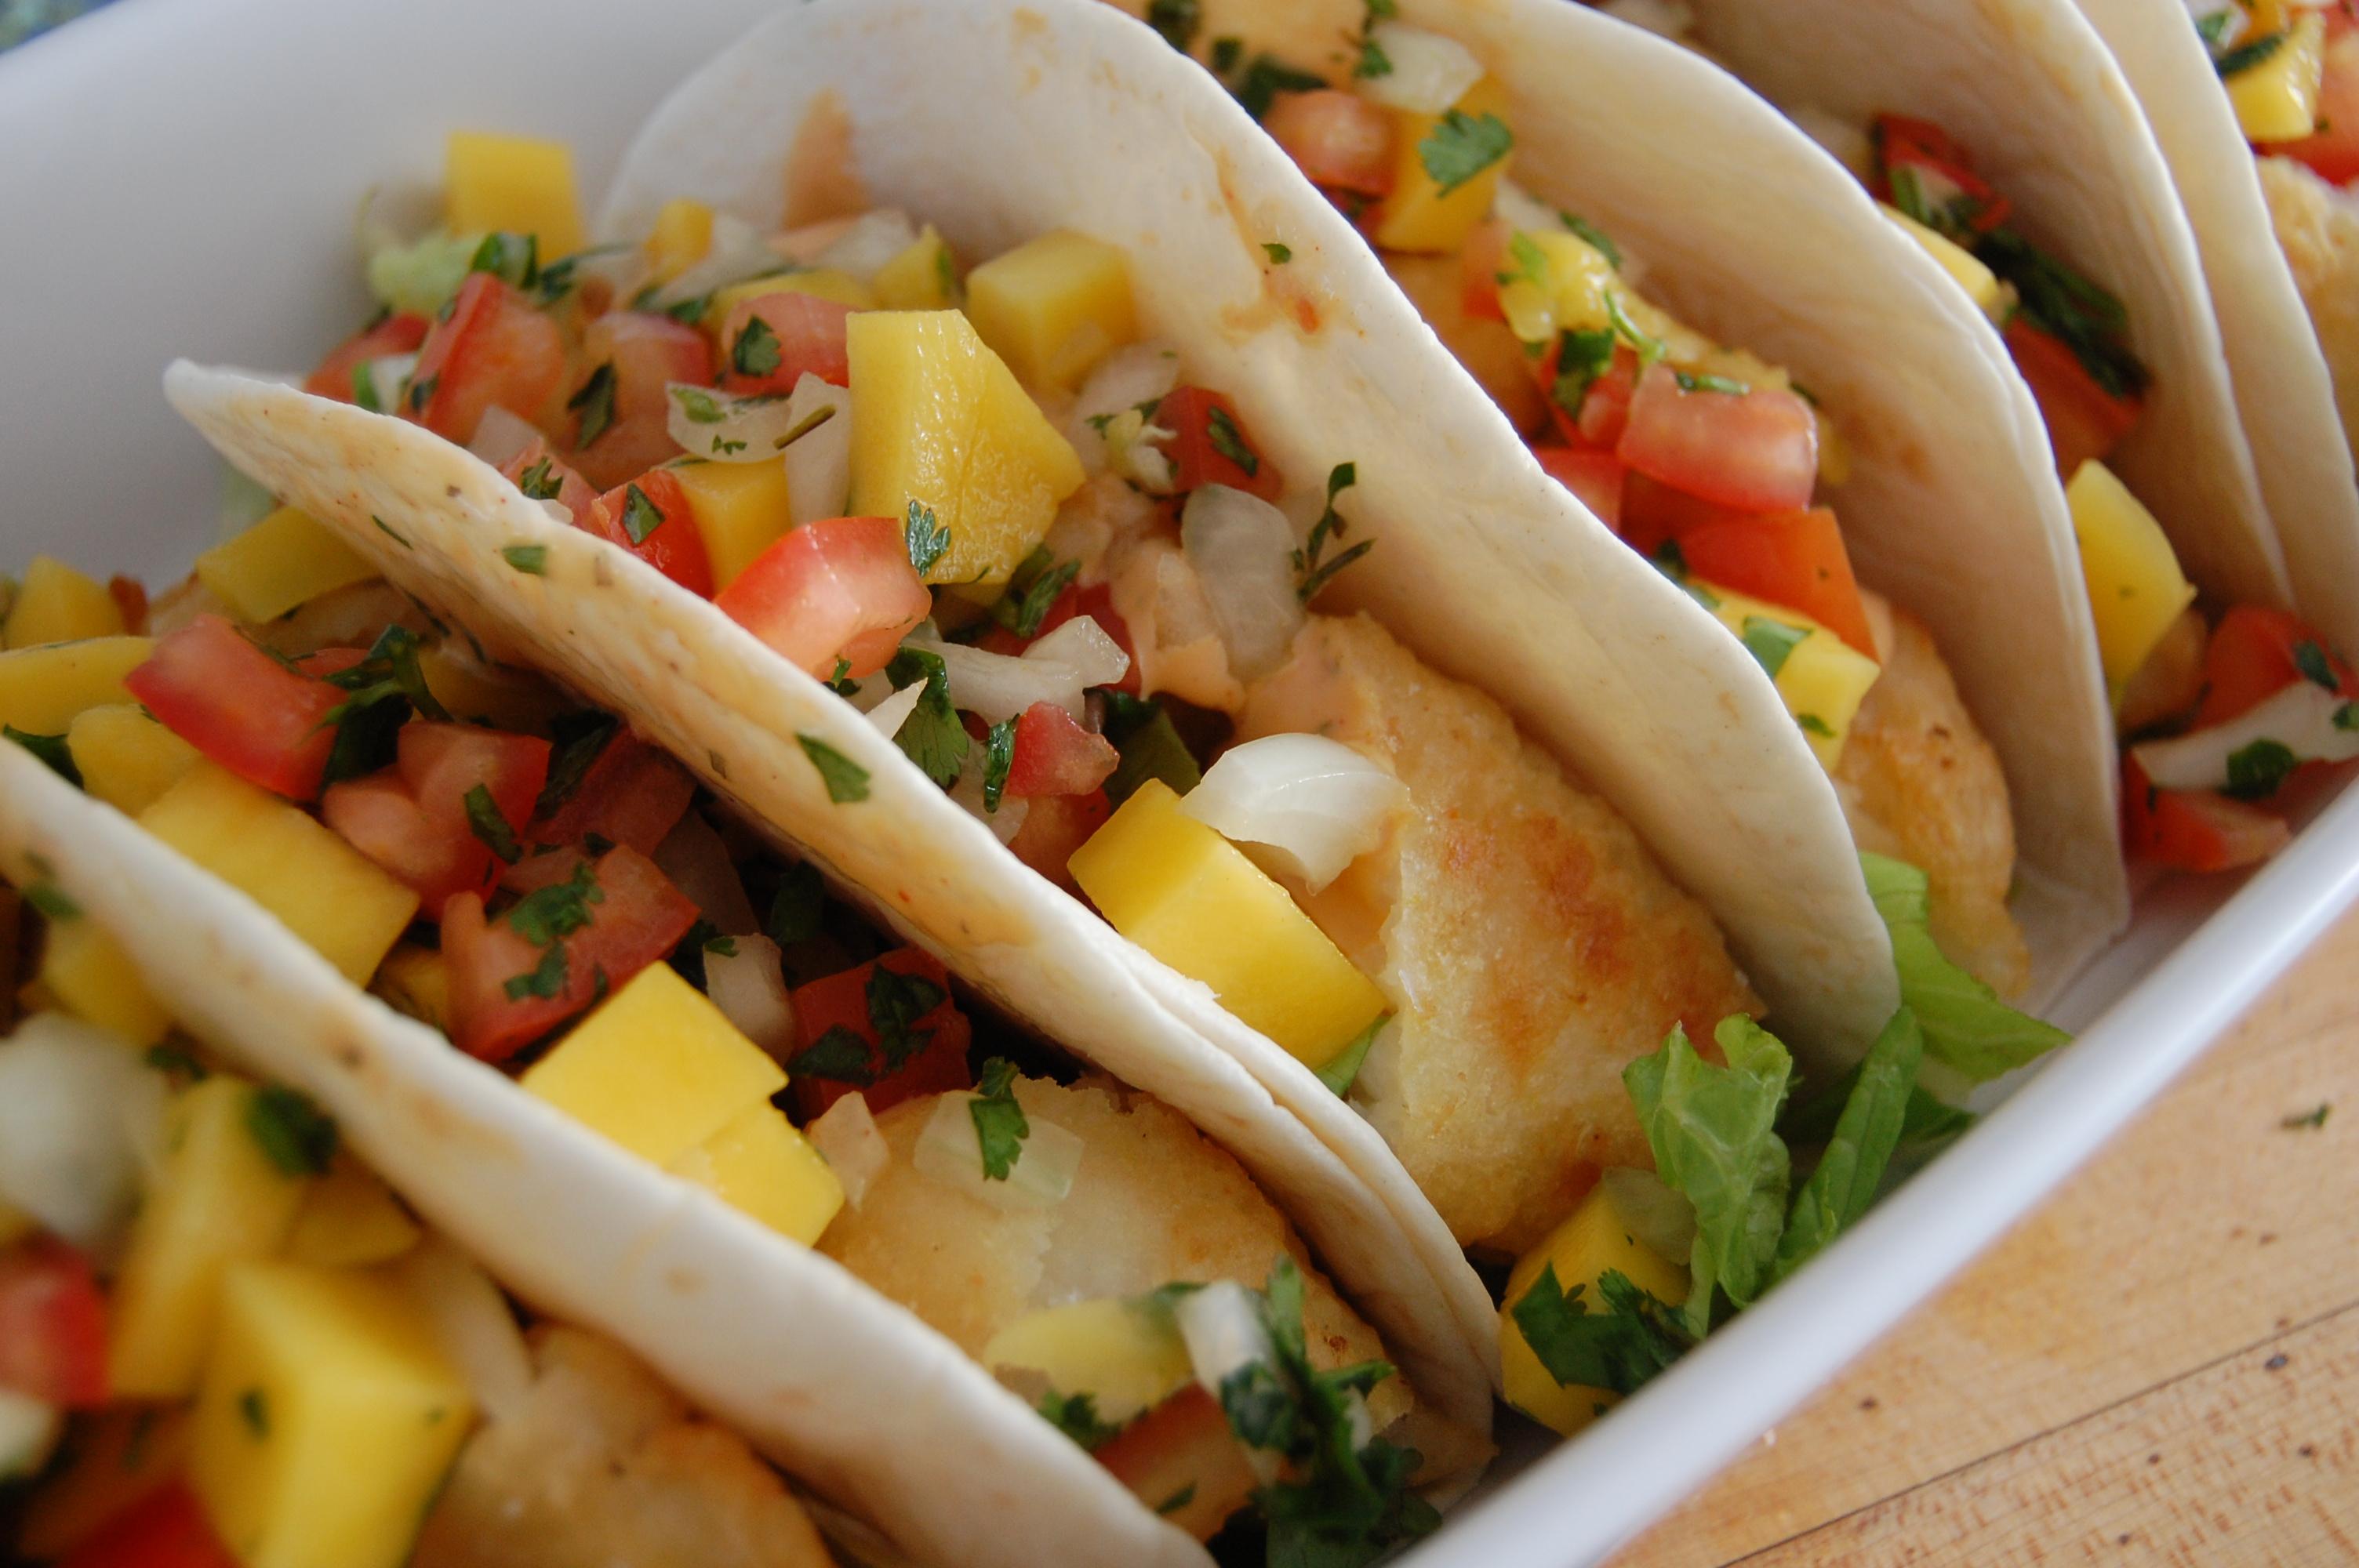 Fish tacos with mango salsa flickr photo sharing for Fish tacos with mango salsa